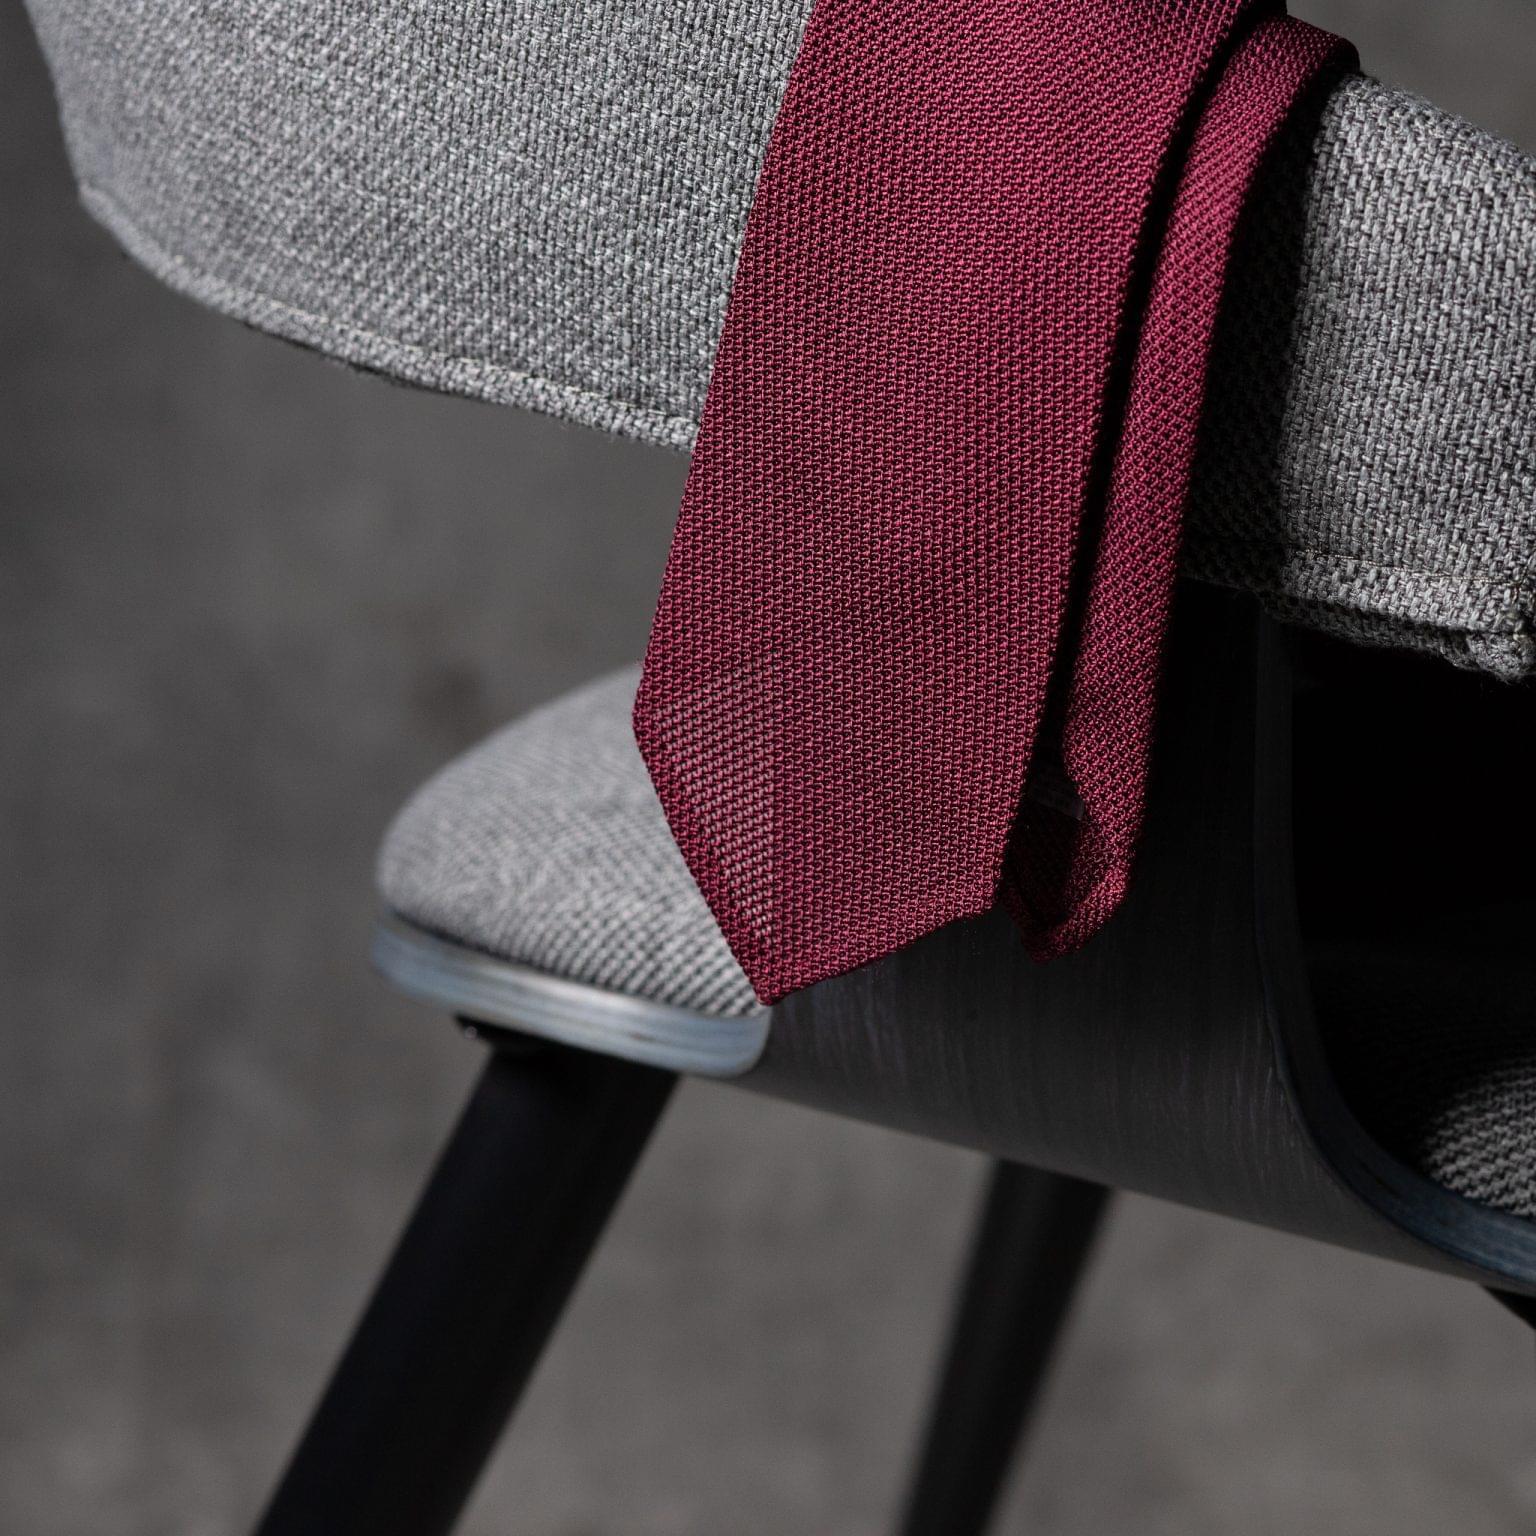 GRENADINE-0278-Tie-Initials-Corbata-Iniciales-The-Seelk-2